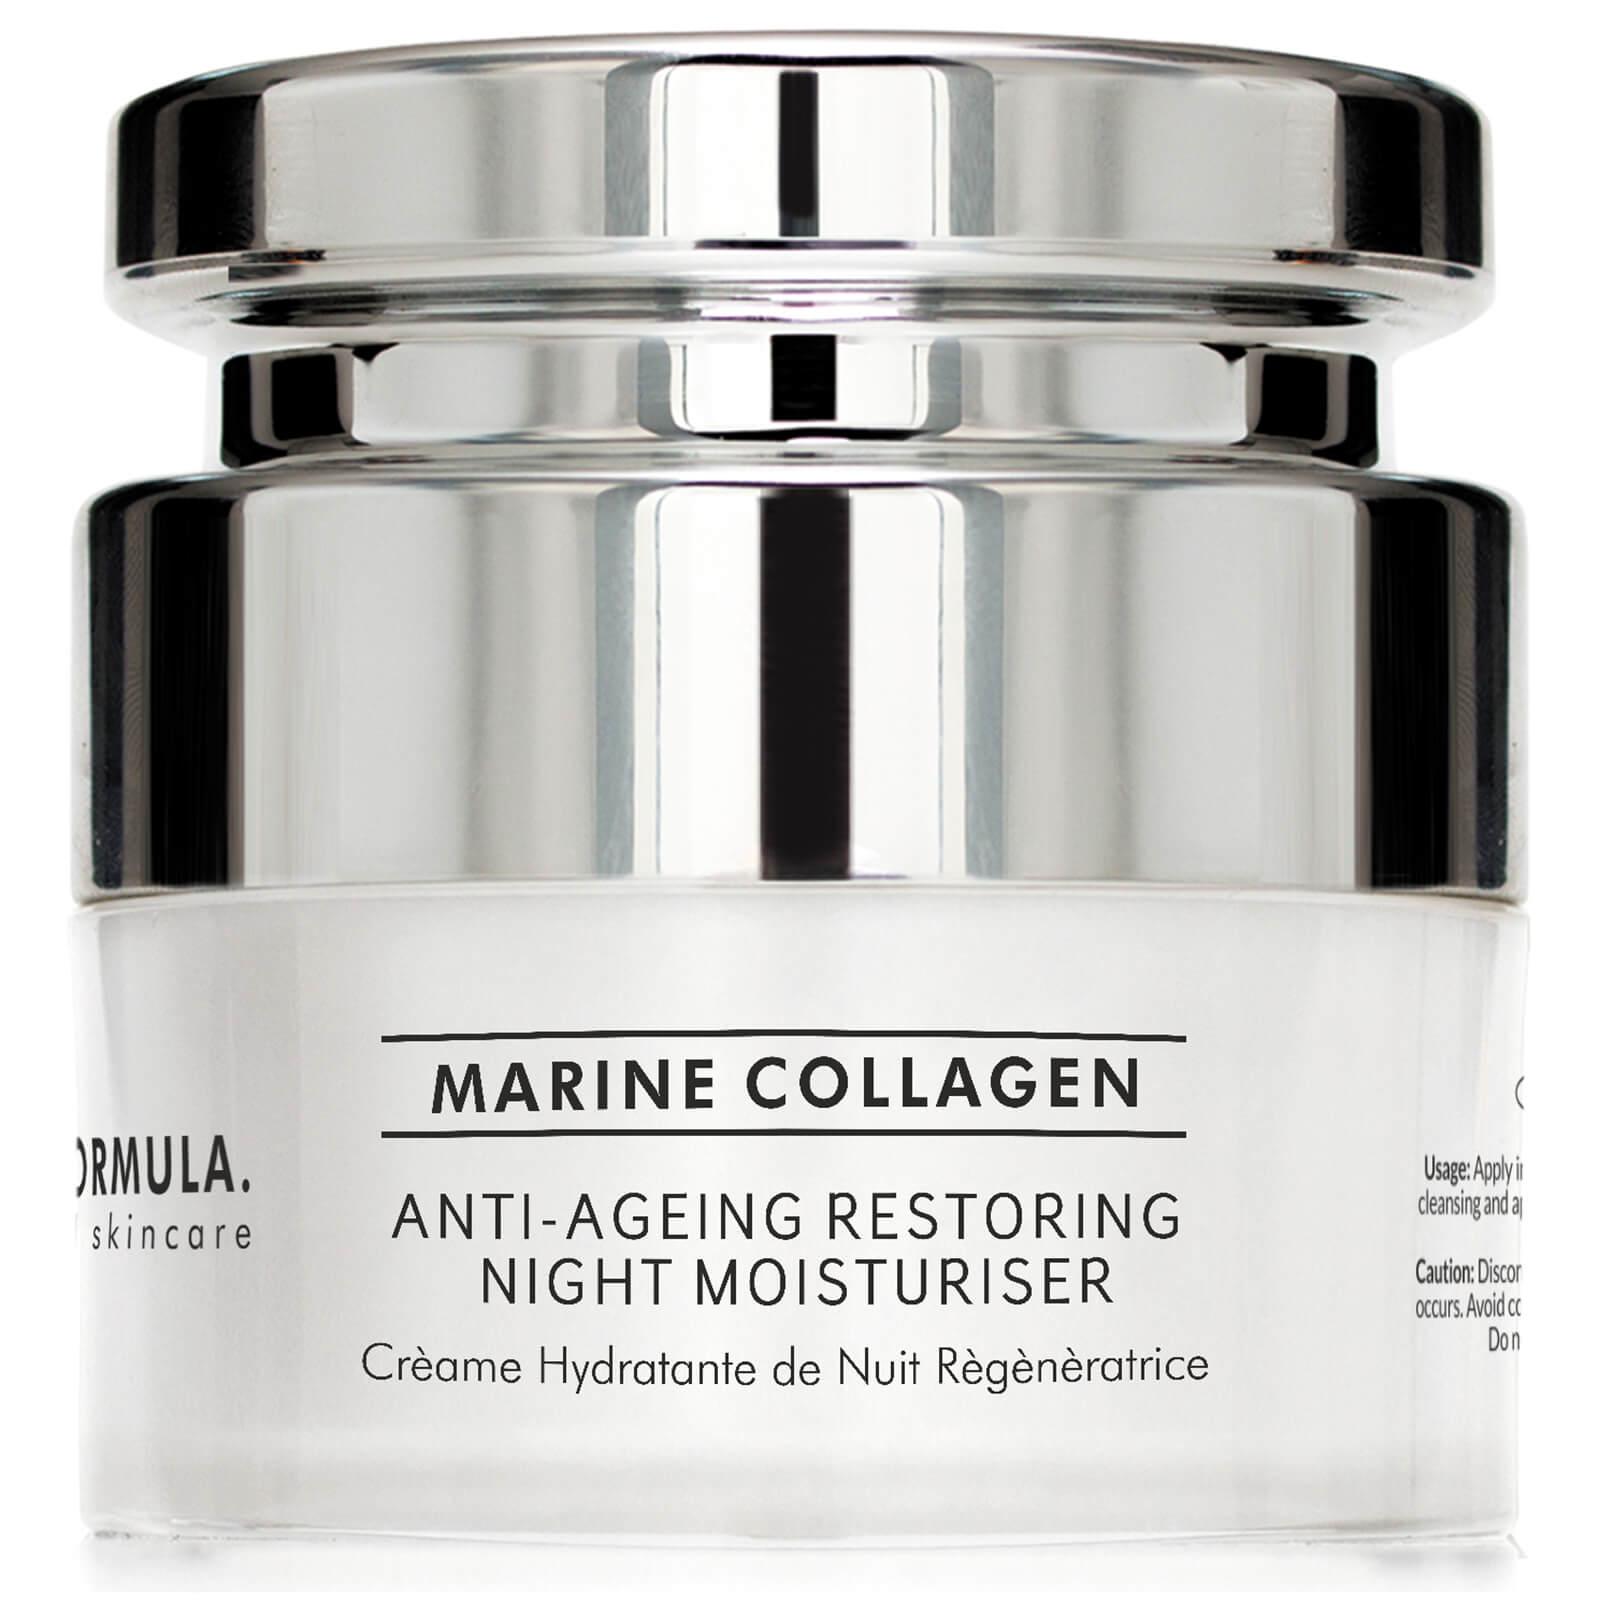 Doctors Formula Marine Collagen Anti-Ageing Restoring Night Moisturiser 50ml